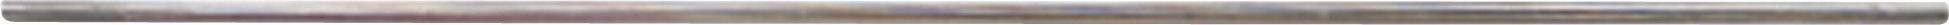 Wolframová elektróda Lorch, Ø 2,4 mm, 5 ks